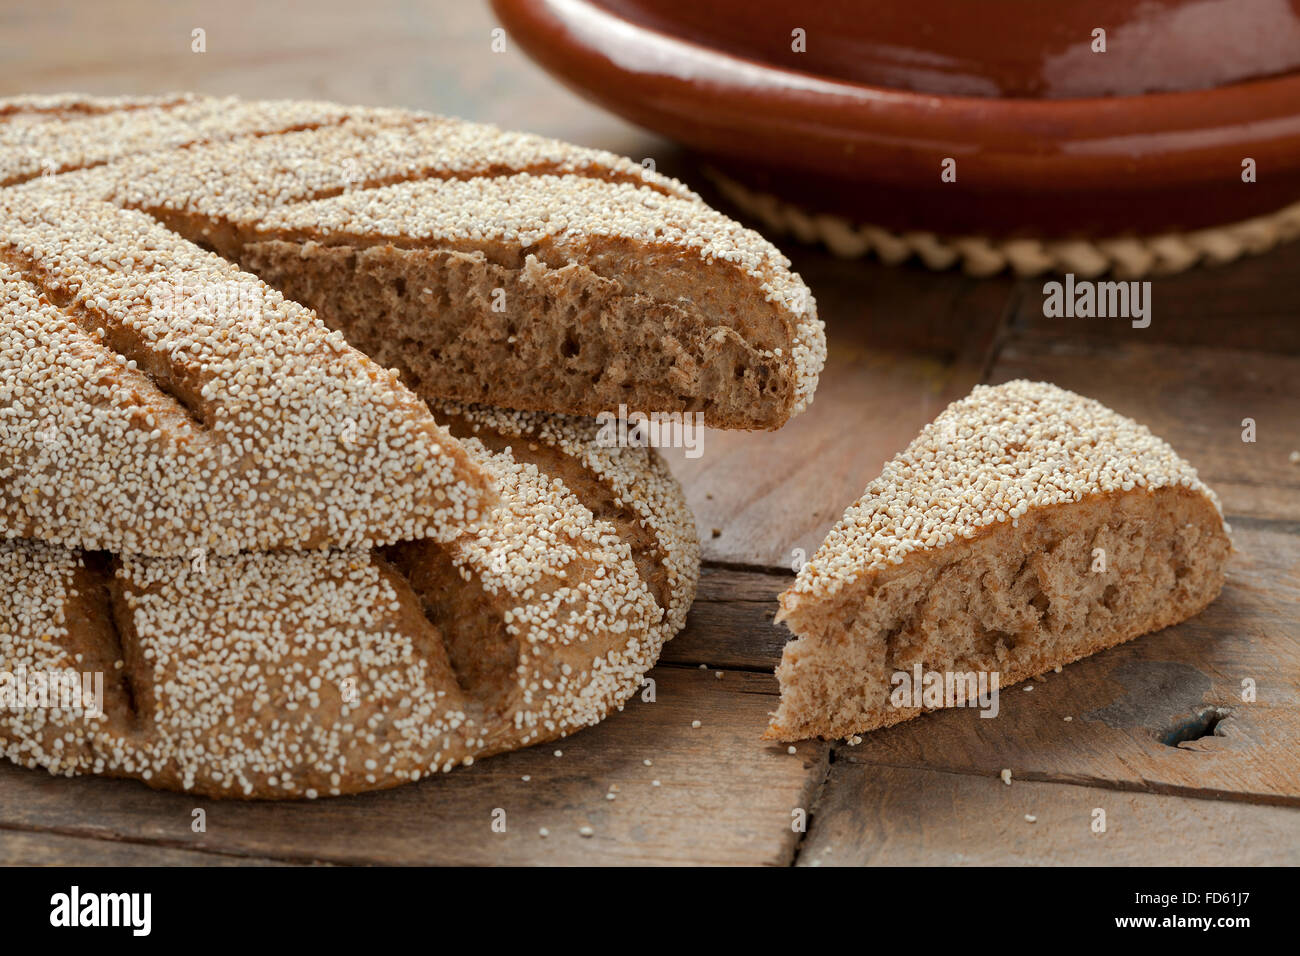 Fresh baked Moroccan semolina bread - Stock Image